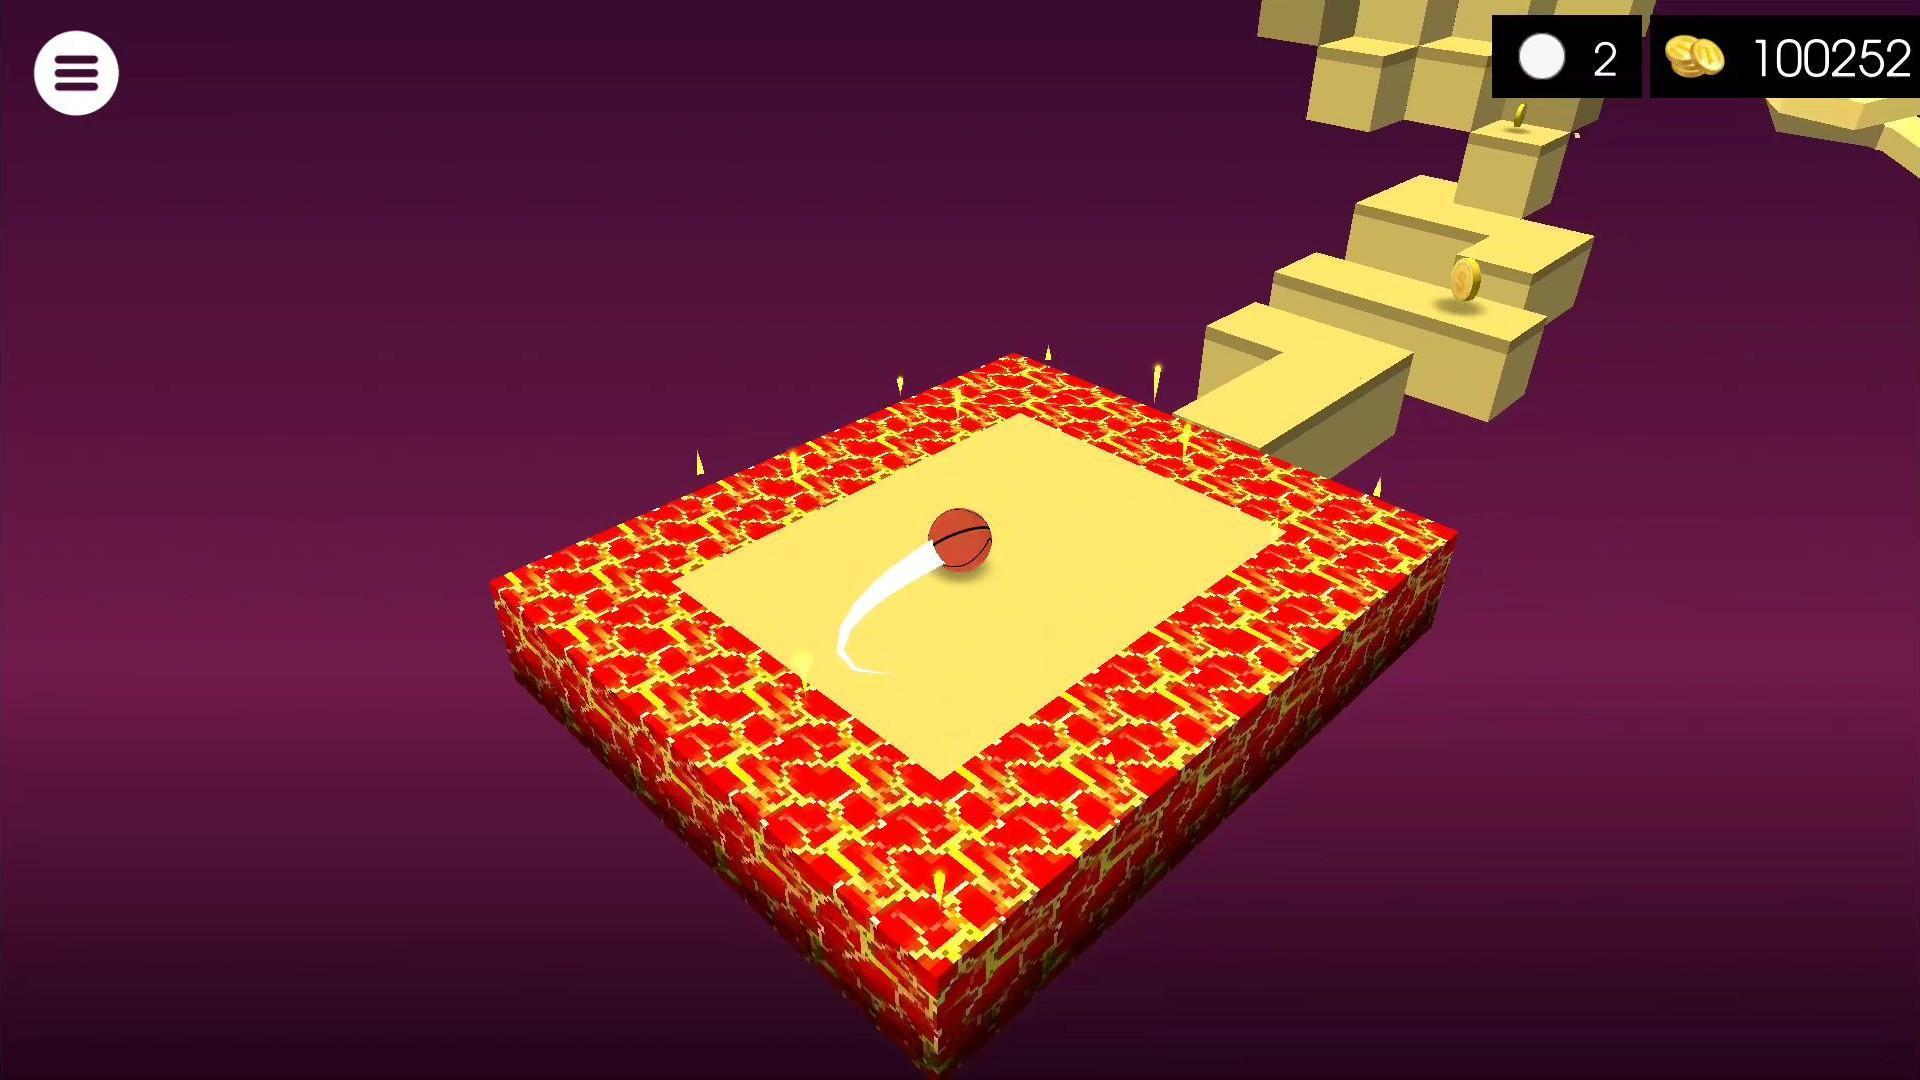 RYWO free 3D roll ball game 1.2.3 Screenshot 7